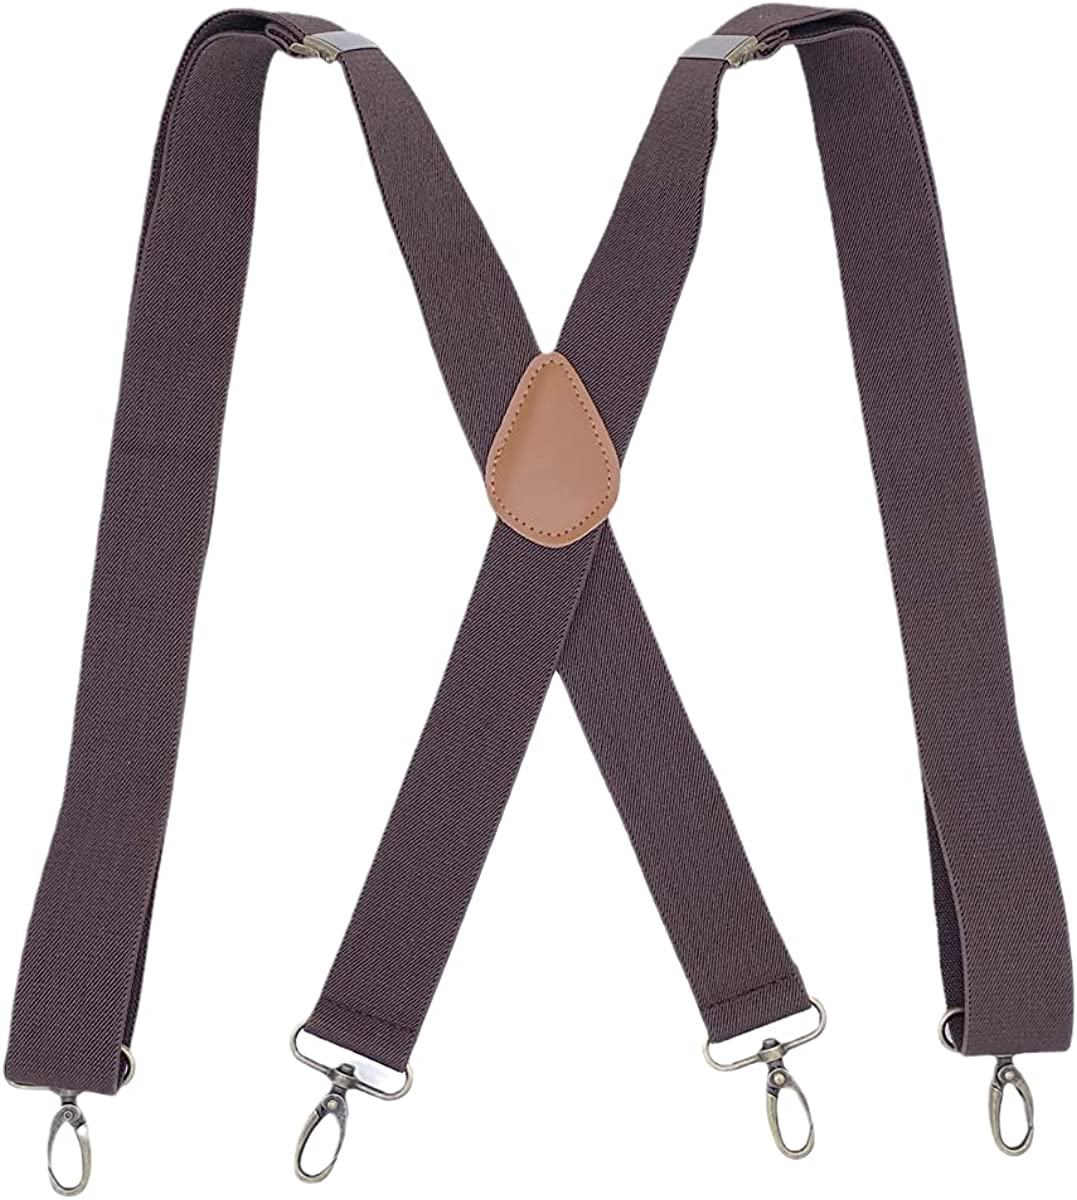 Suspenders for Men with Swivel Hooks Heavy Duty X-Back Adjustable Elastic Brace